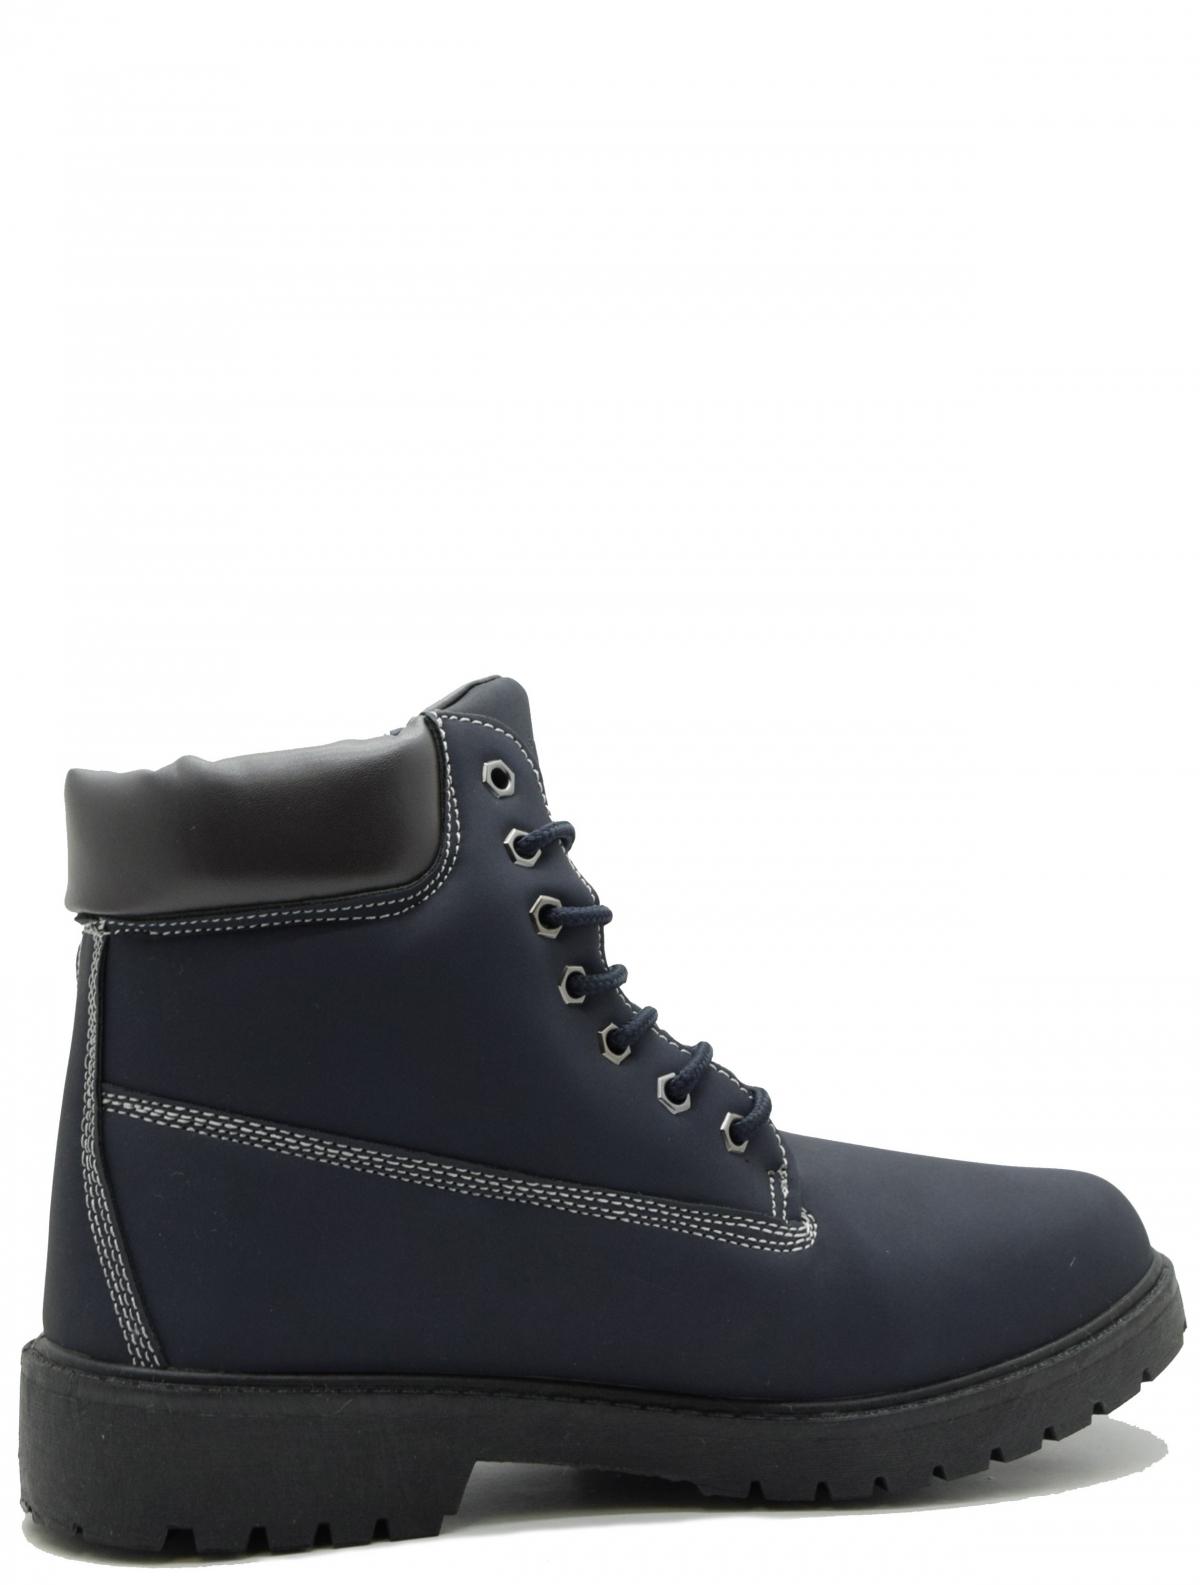 CROSBY 488182/02-05 мужские ботинки